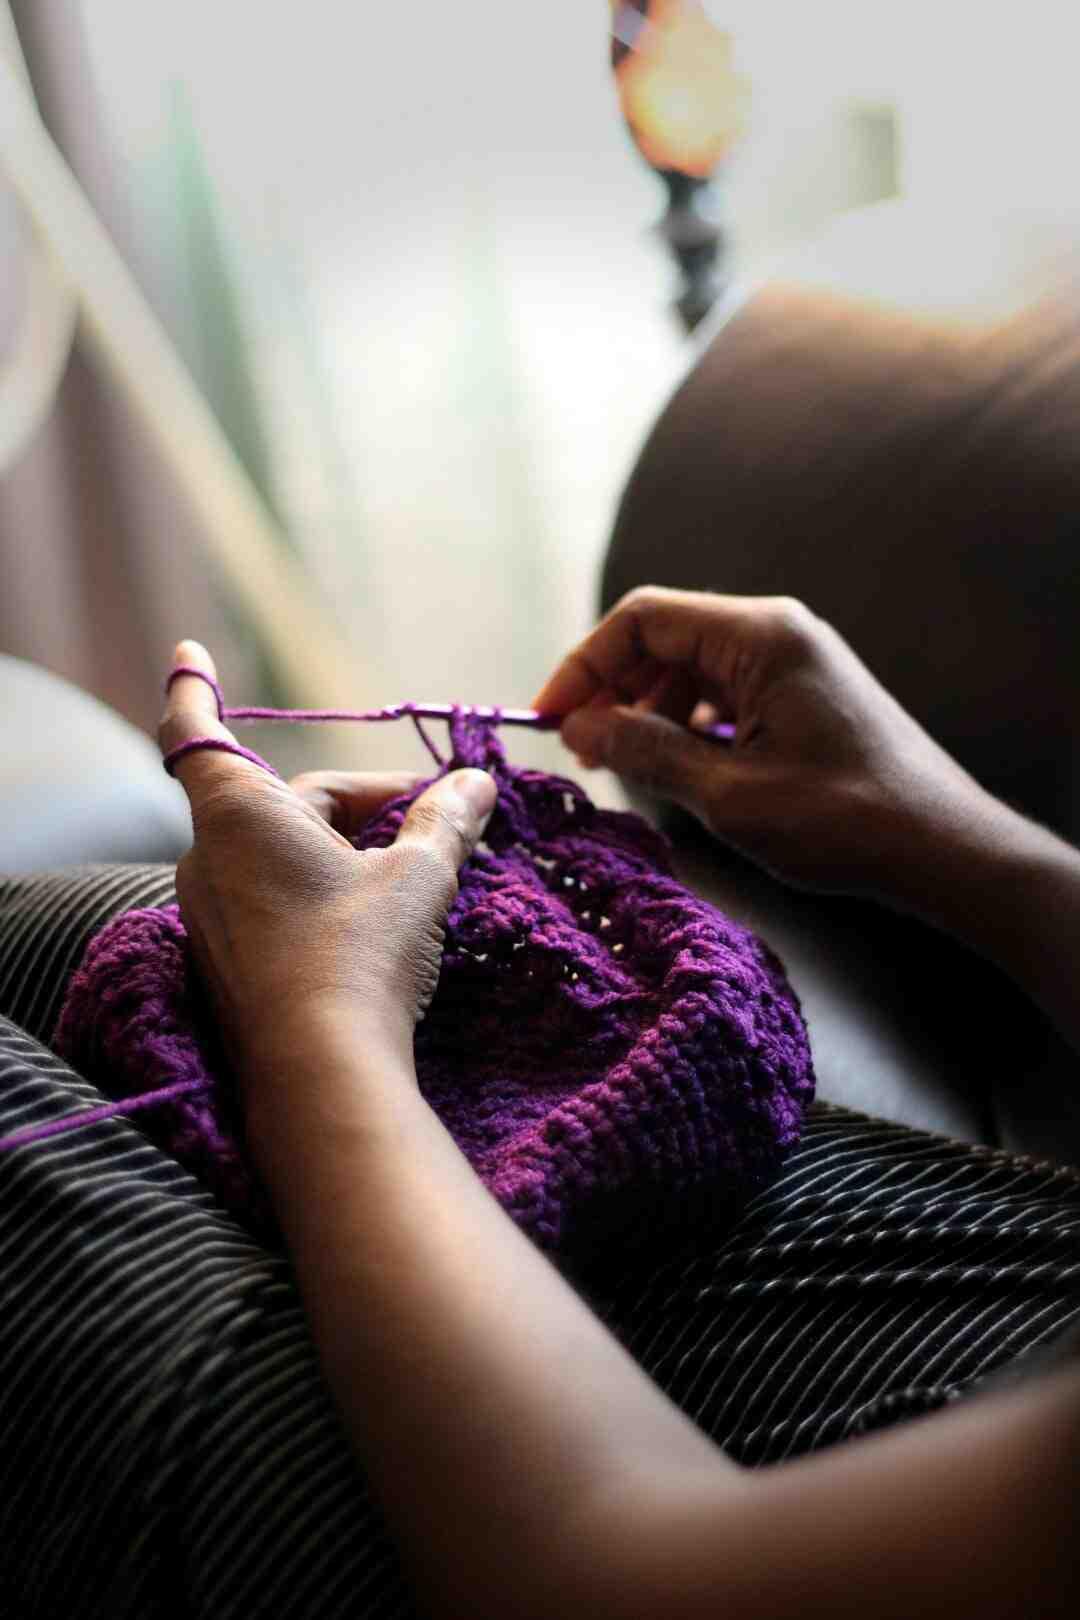 Can you use a regular crochet hook for Tunisian crochet?